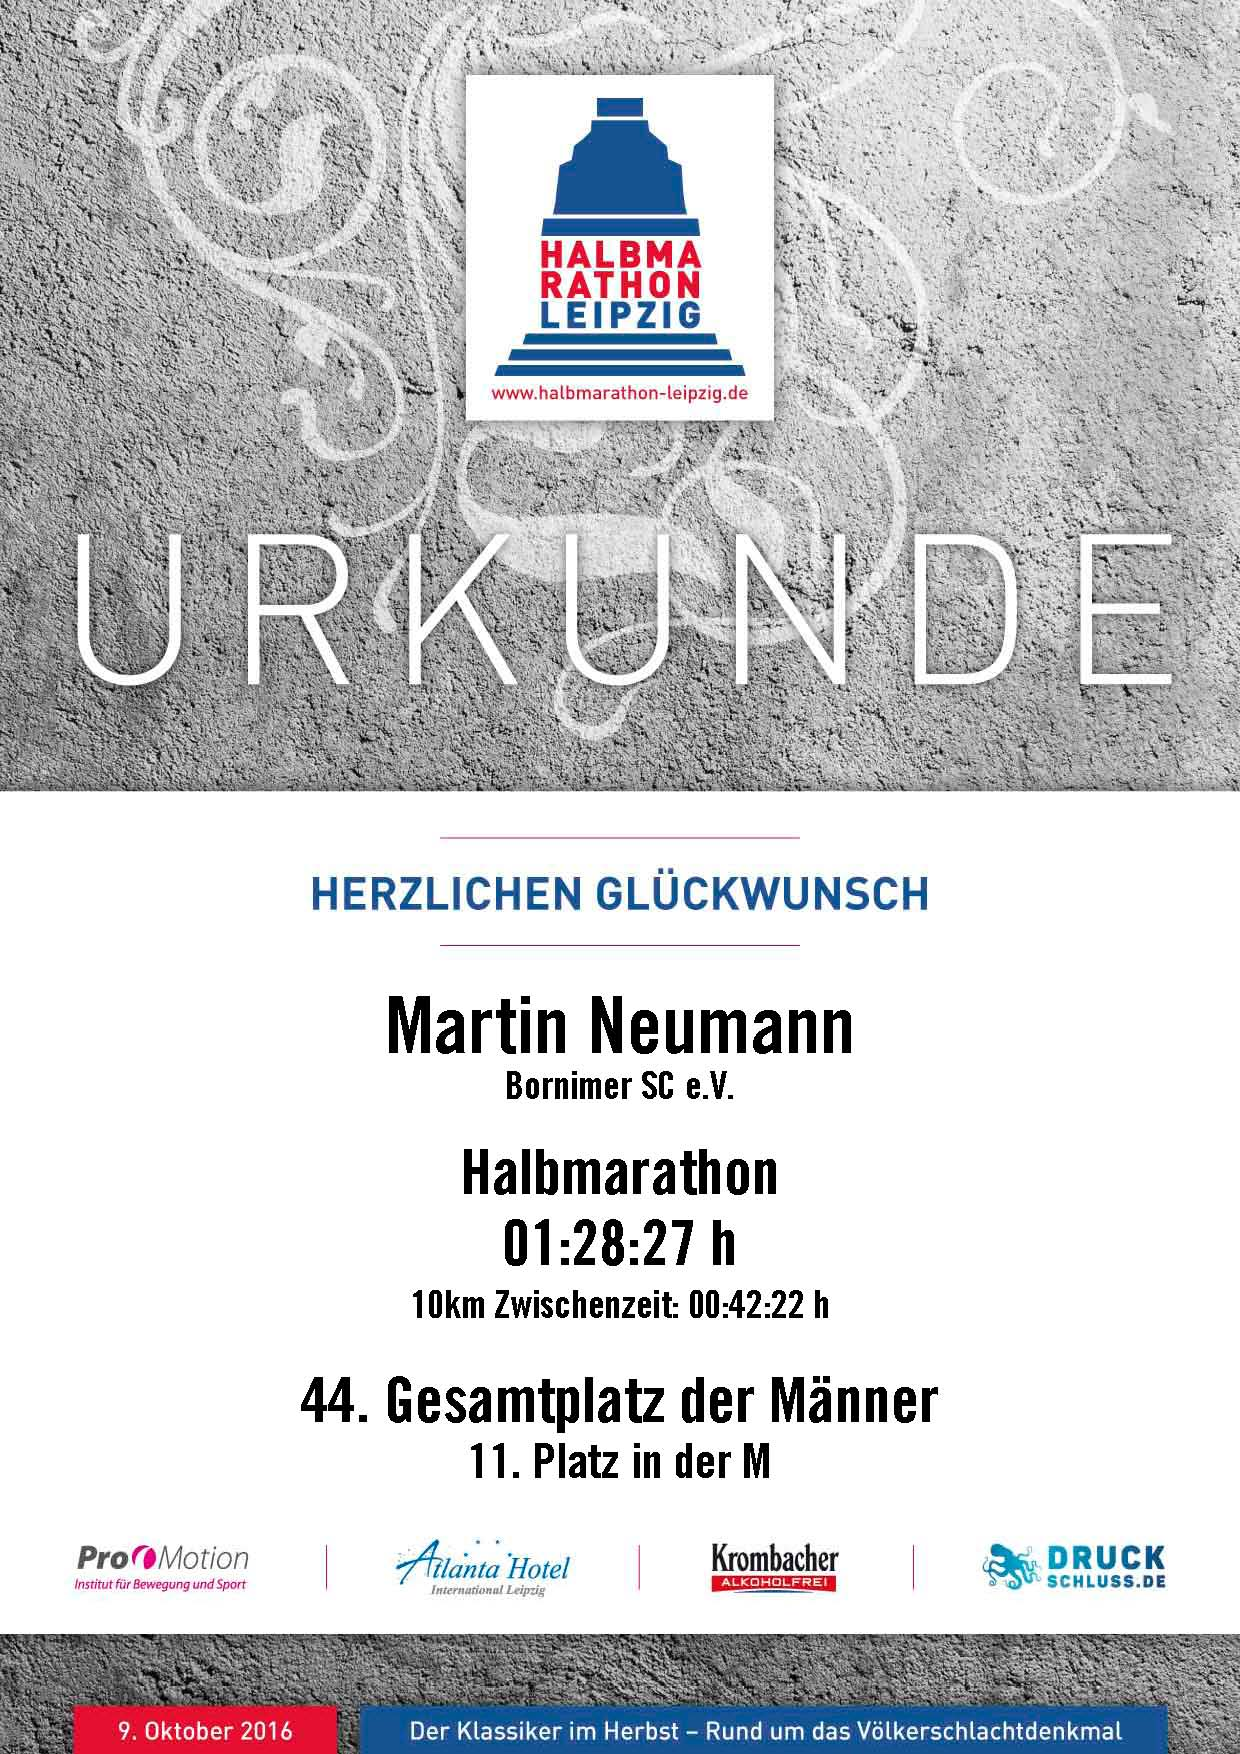 cert-halbmarathon-leipzig-2016-2077